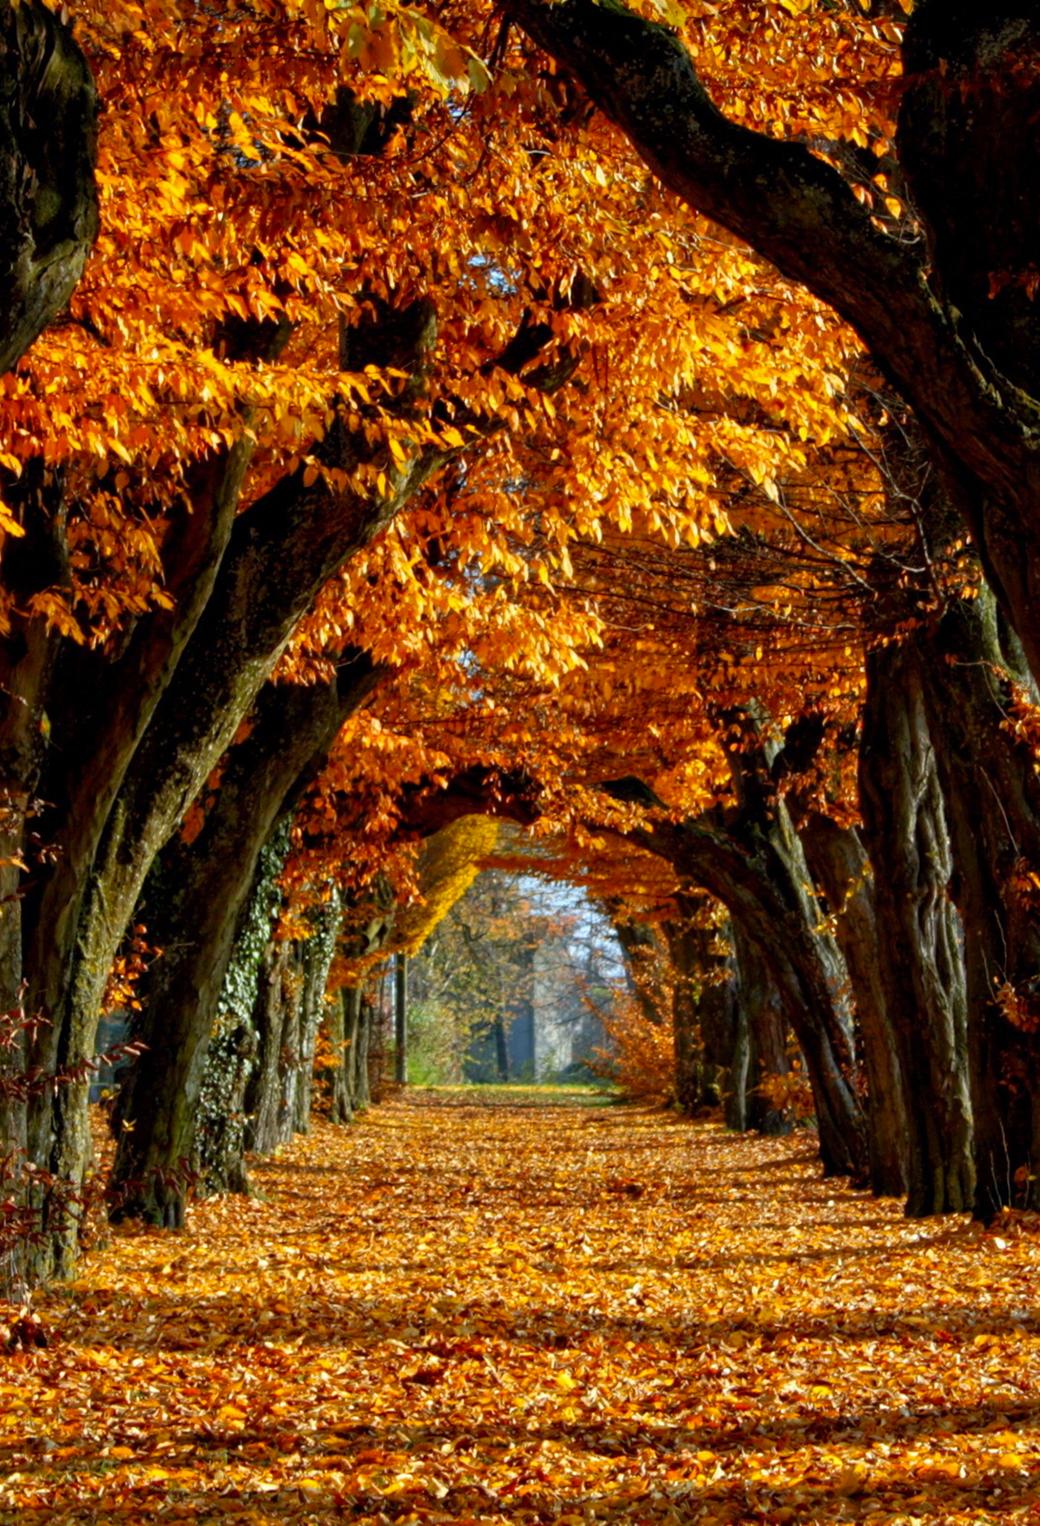 Autumn Autumn Wallpaper For Iphone X 8 7 6 Free